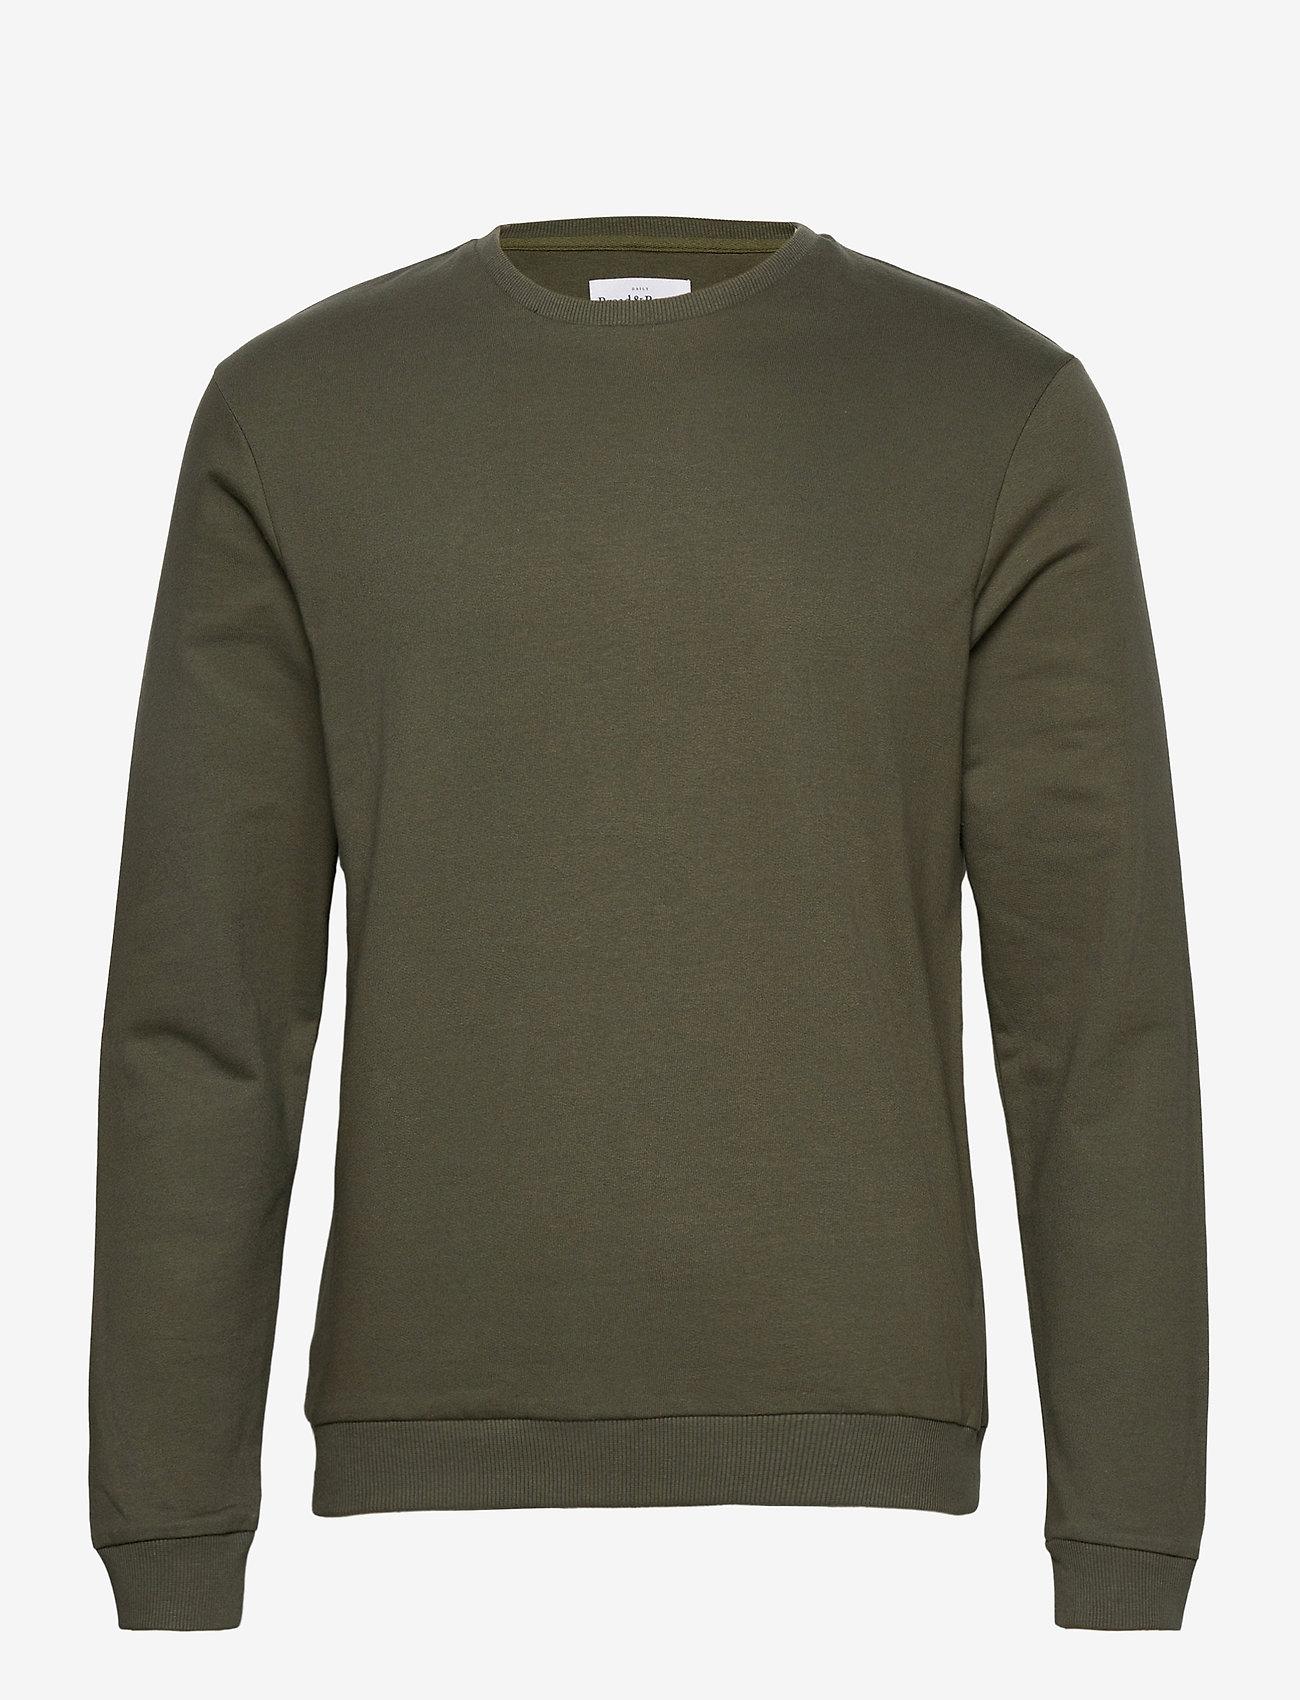 Bread & Boxers - Sweatshirt - truien - olive green - 0